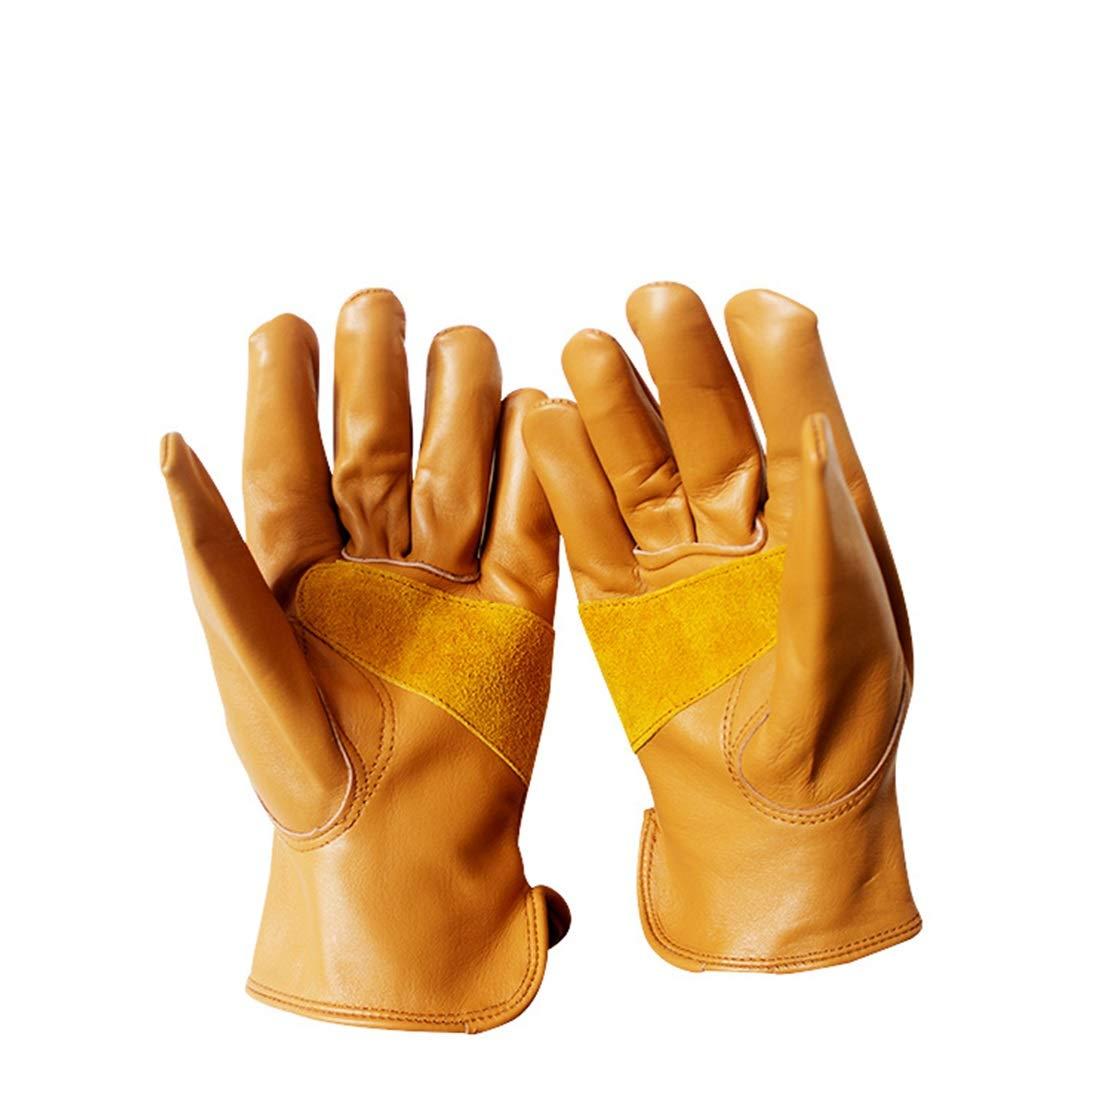 JESSIEKERVIN YY3 Outdoor Riding Handschuhe Braun Leder Fahrer Handschuhe Style Short Style Handschuhe Vollleder Soft Wear Resistant Handschuhe 880692